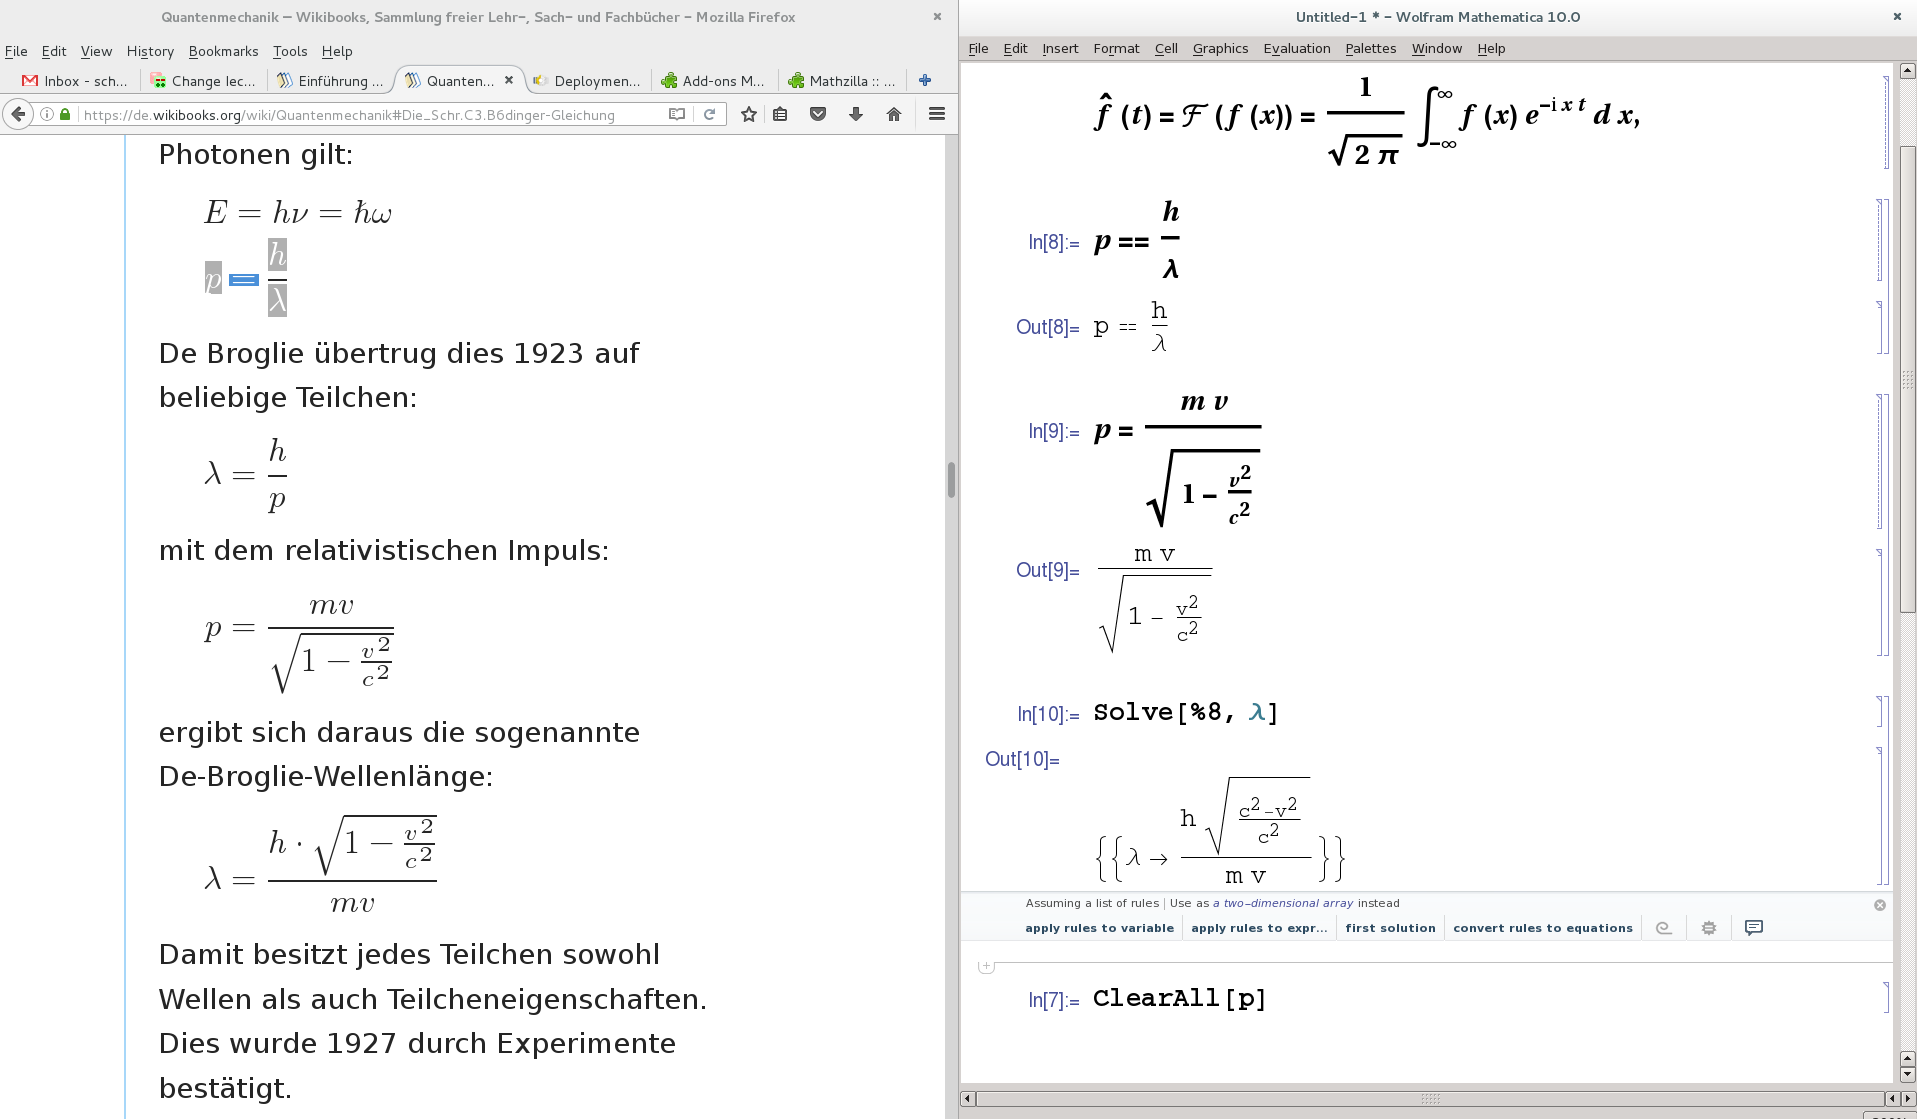 File:Copy Math form Wikipedia to Mathematica.png - Wikimedia Commons